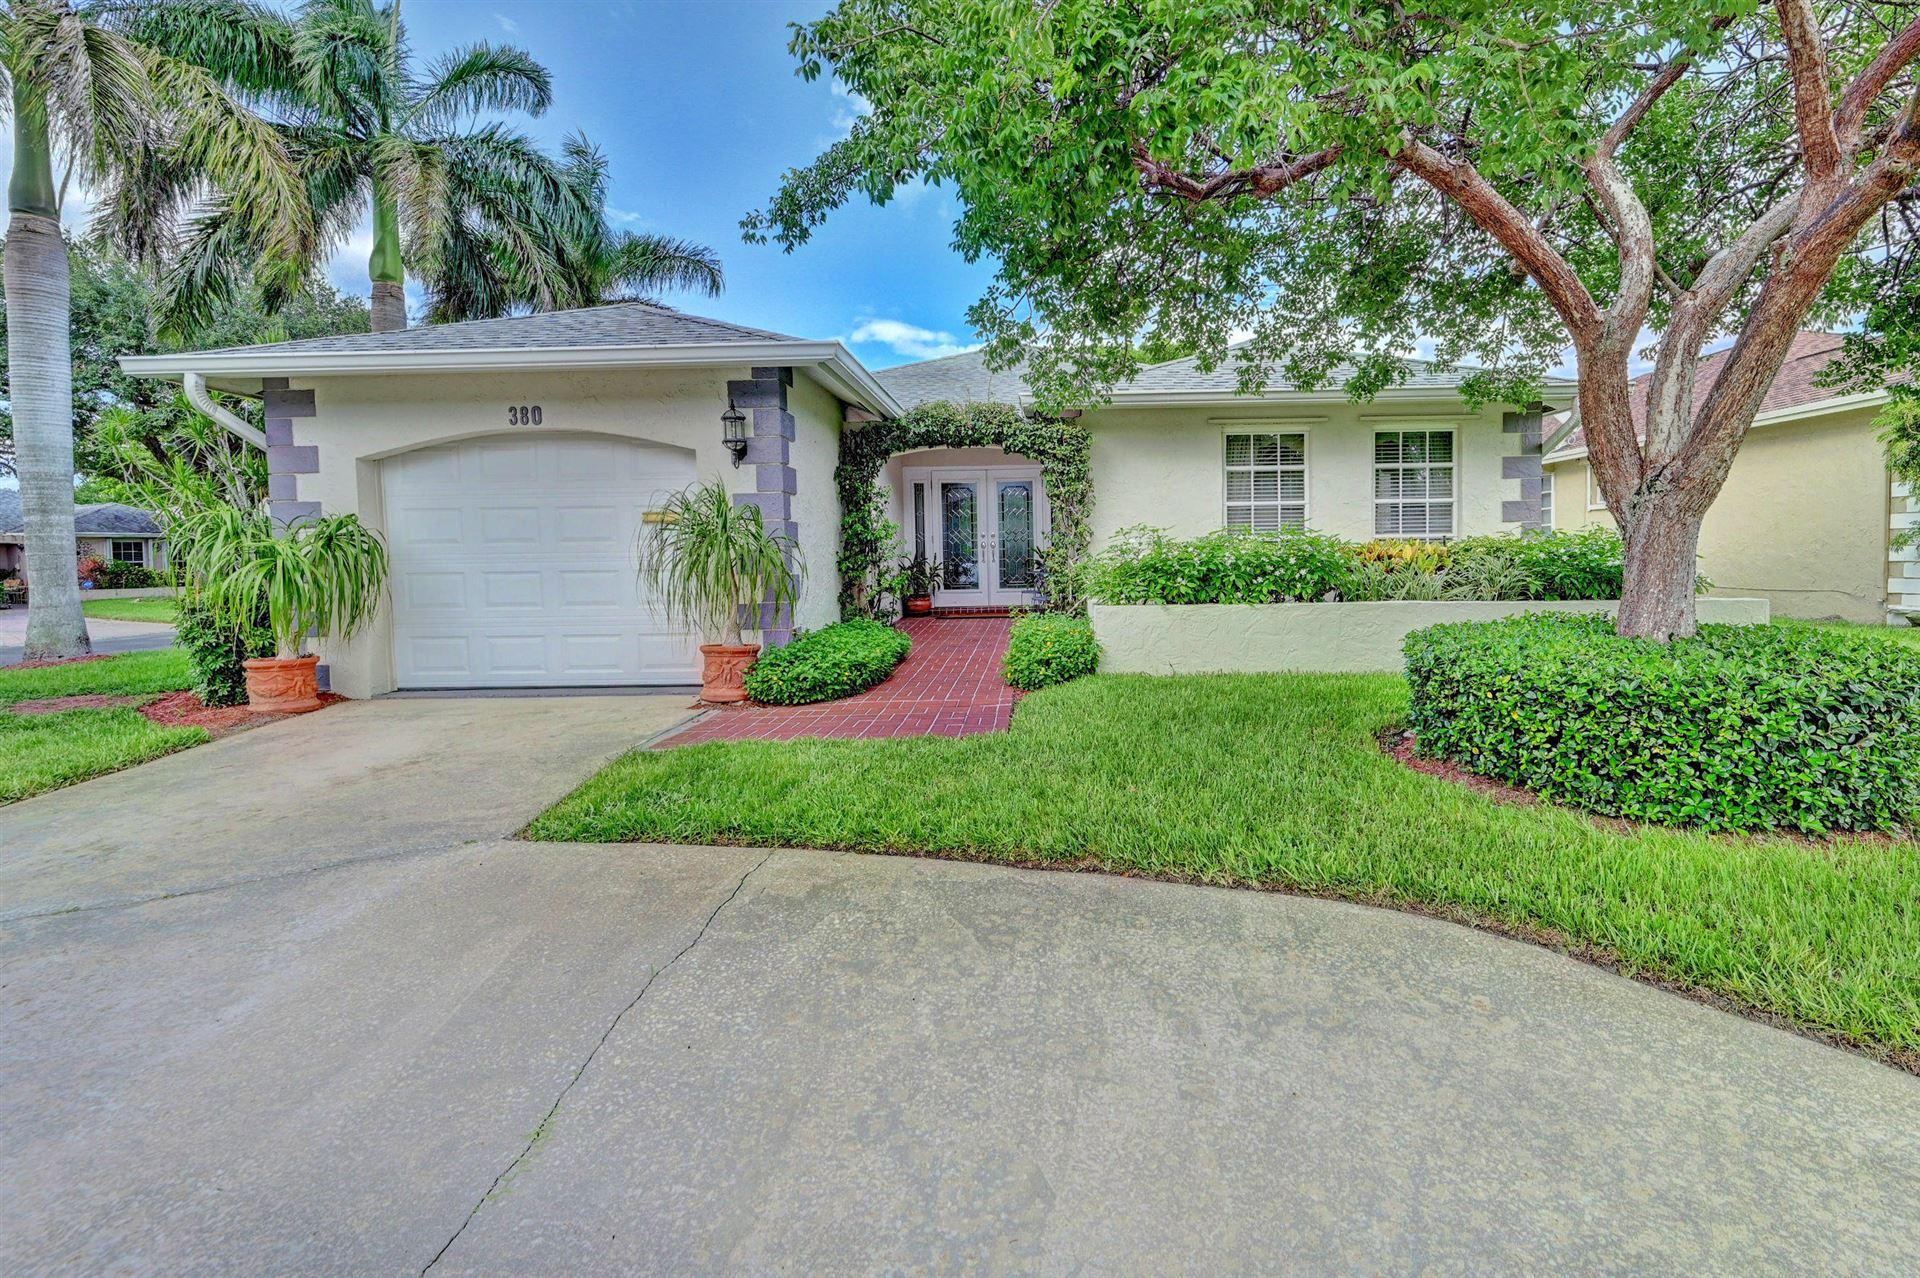 380 SW 5th Way, Boca Raton, FL 33432 - #: RX-10731222